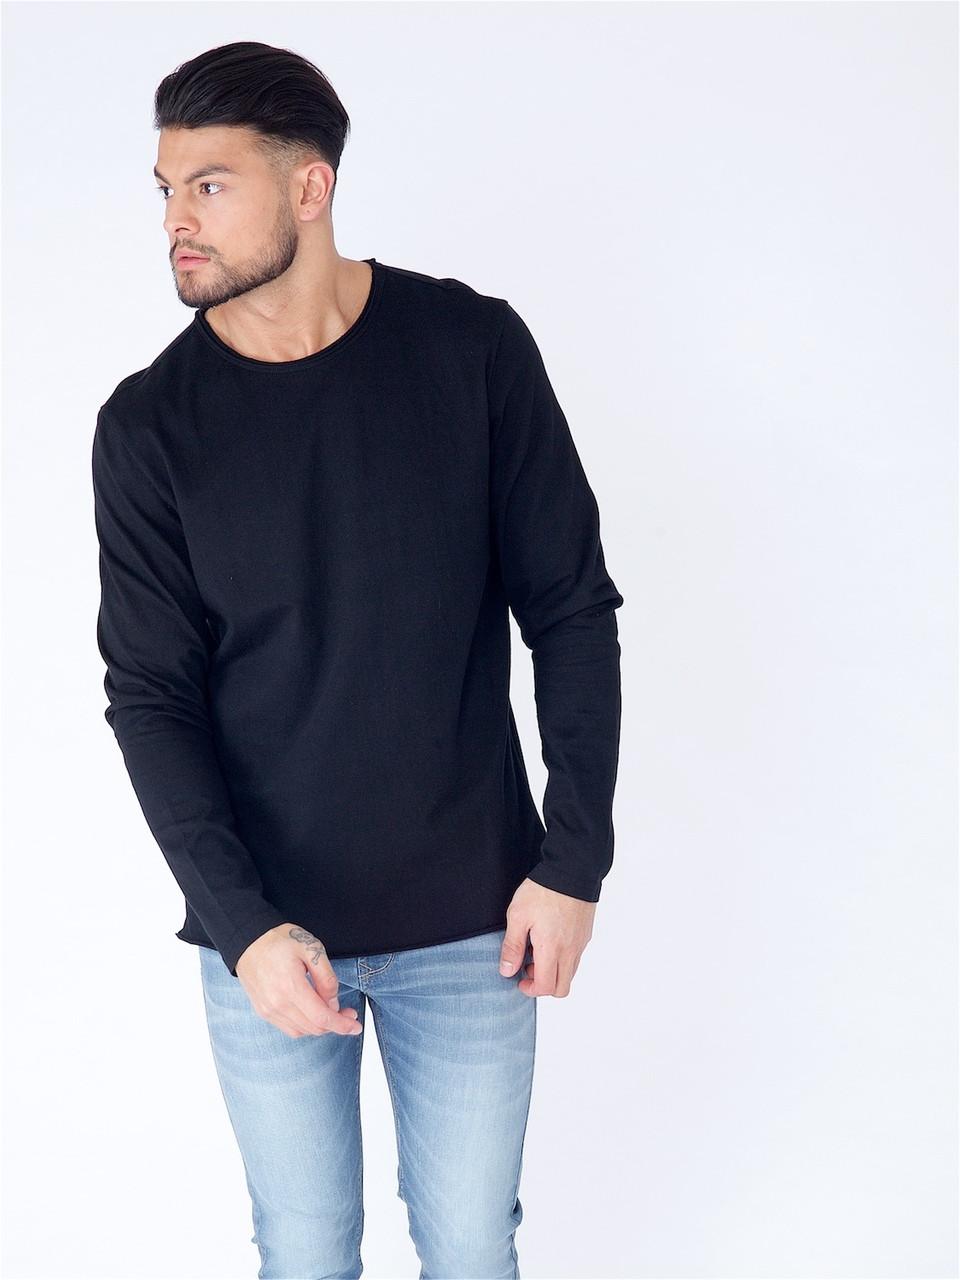 Black Long Sleeve Basic Raw Edge Top